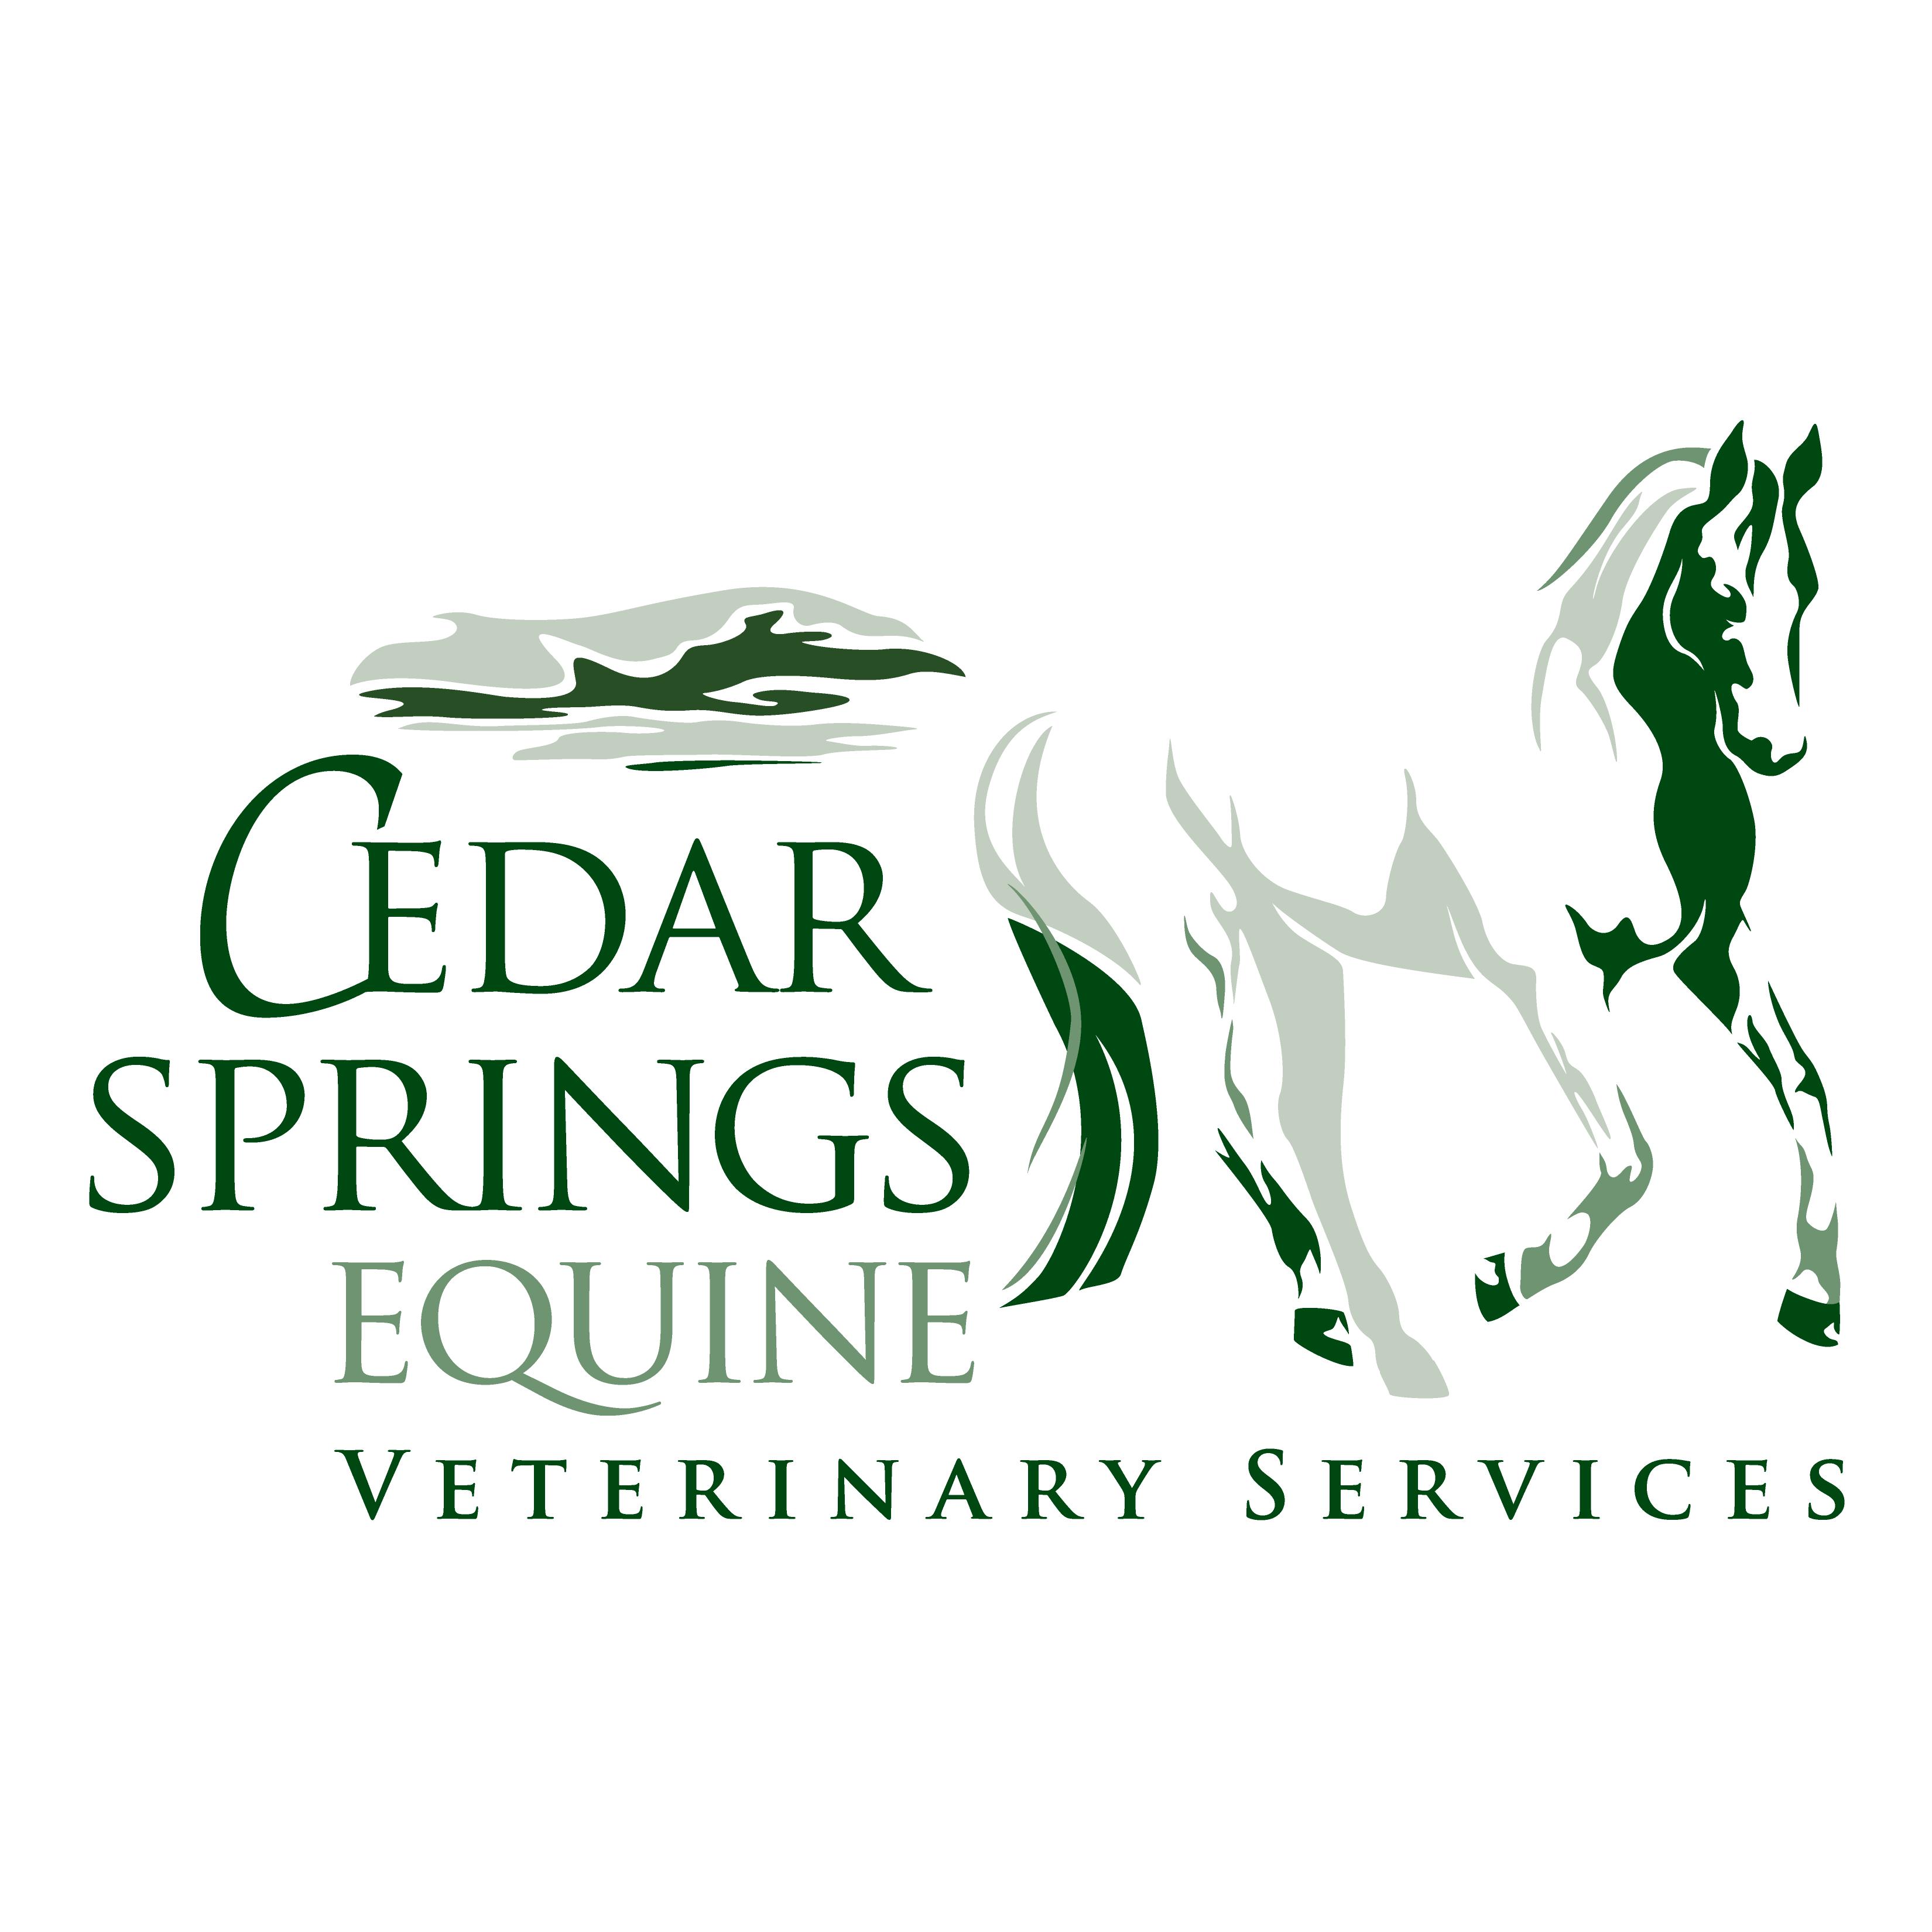 Cedar Springs Equine